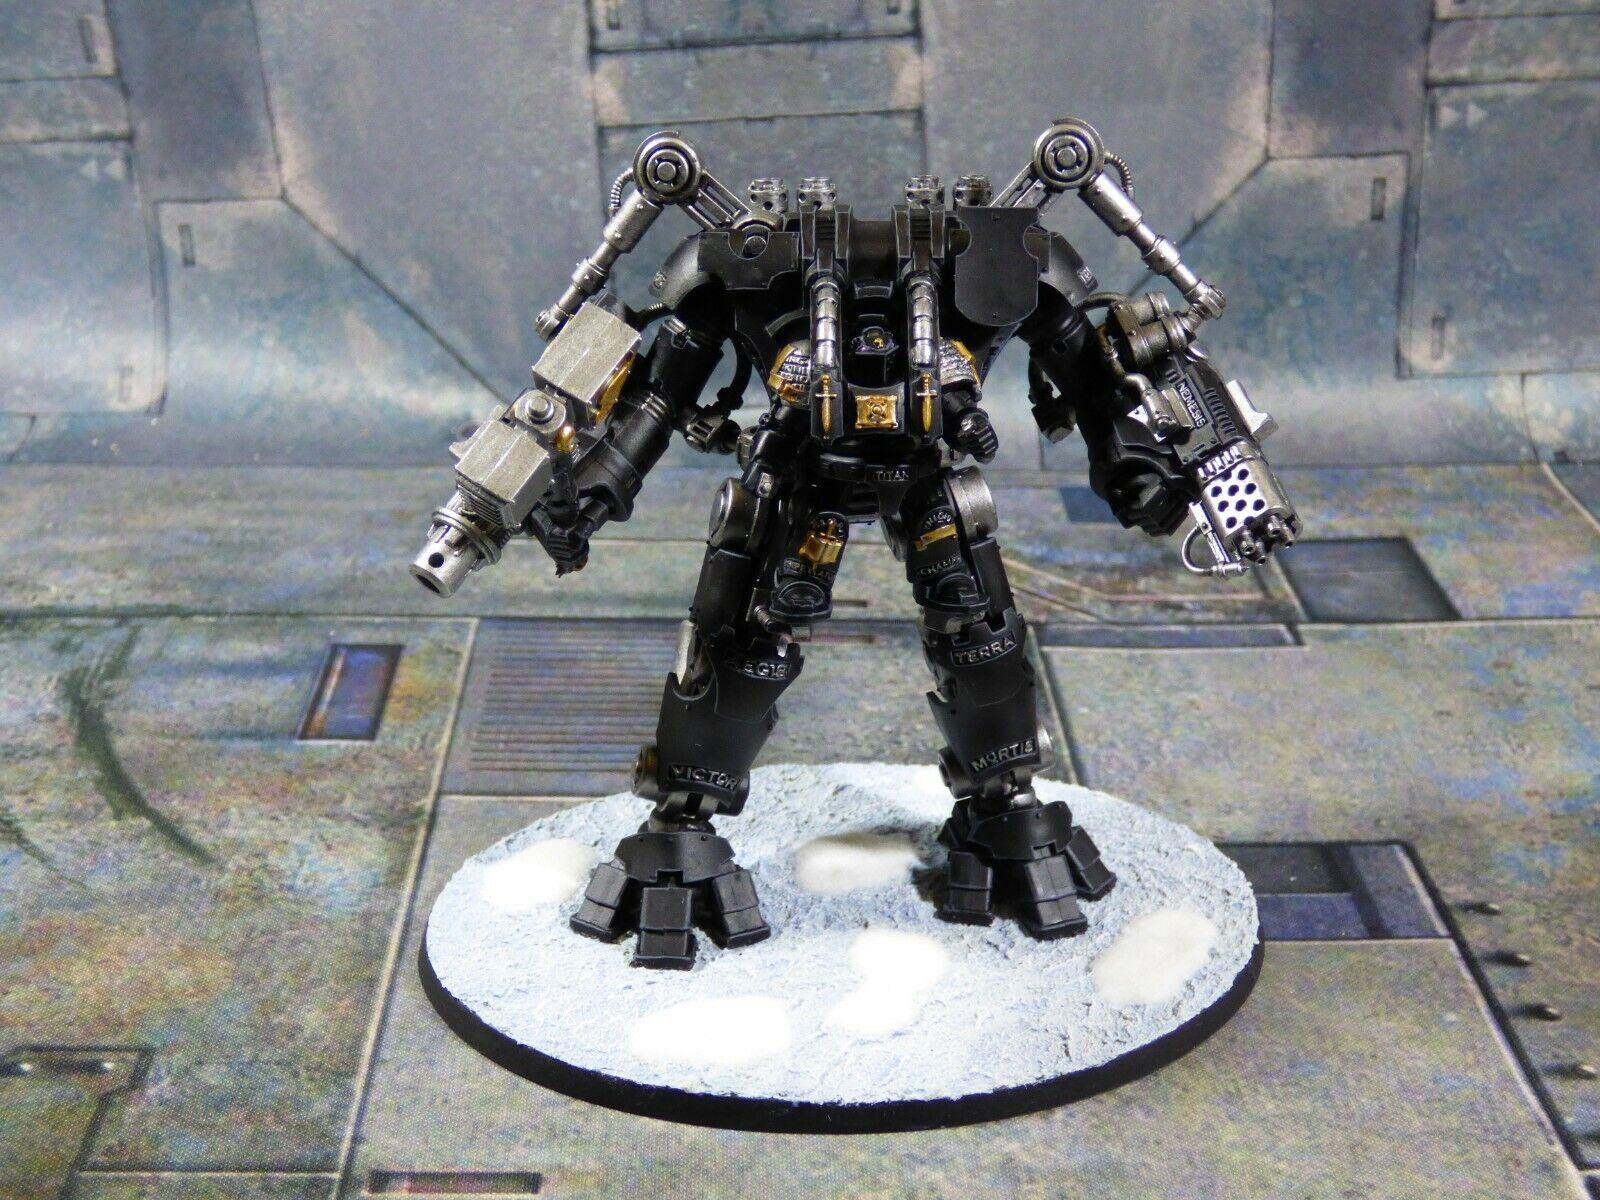 gris Knights Nemesis Dreadknight Space Marine Games Workshop bien peint  (Y691)  réductions incroyables